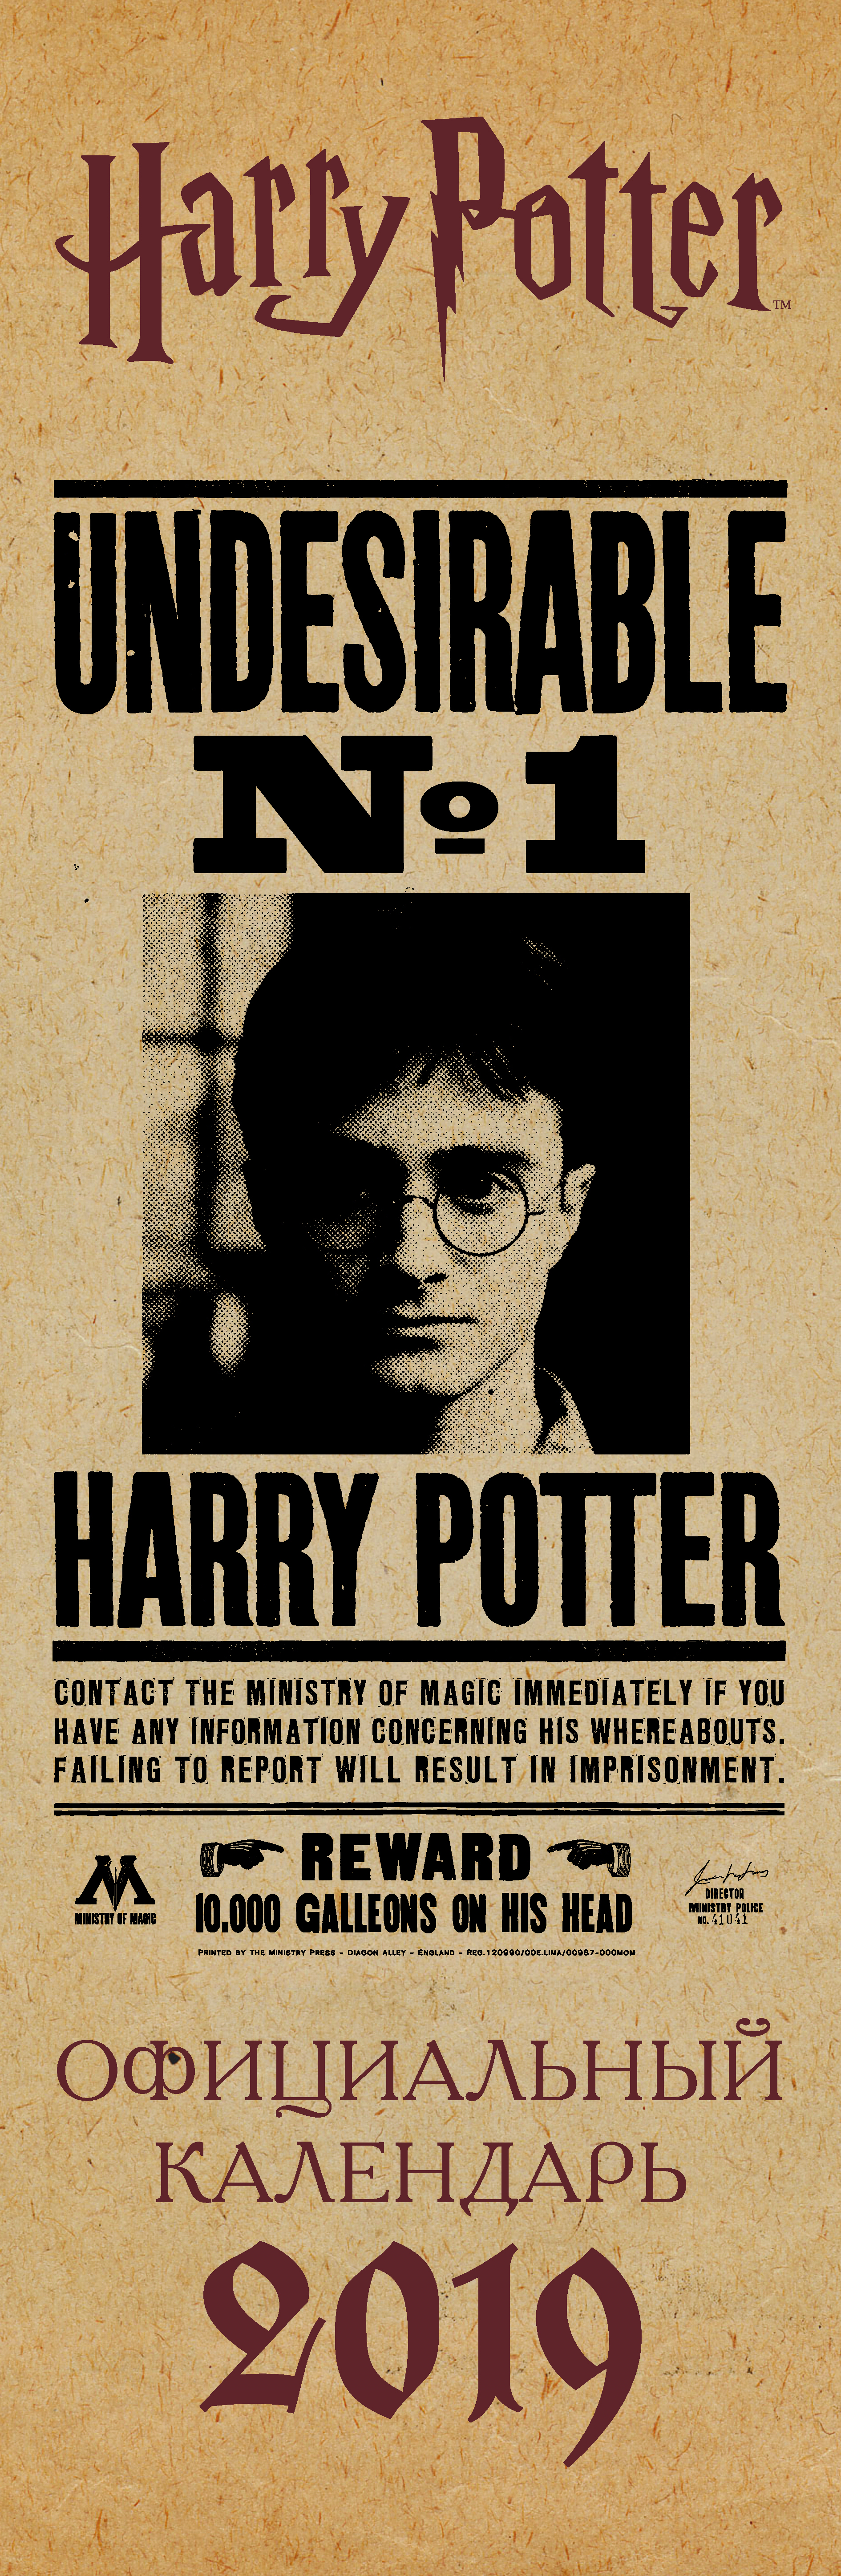 Гарри Поттер. Календарь настенный на 2019 год (160х490)